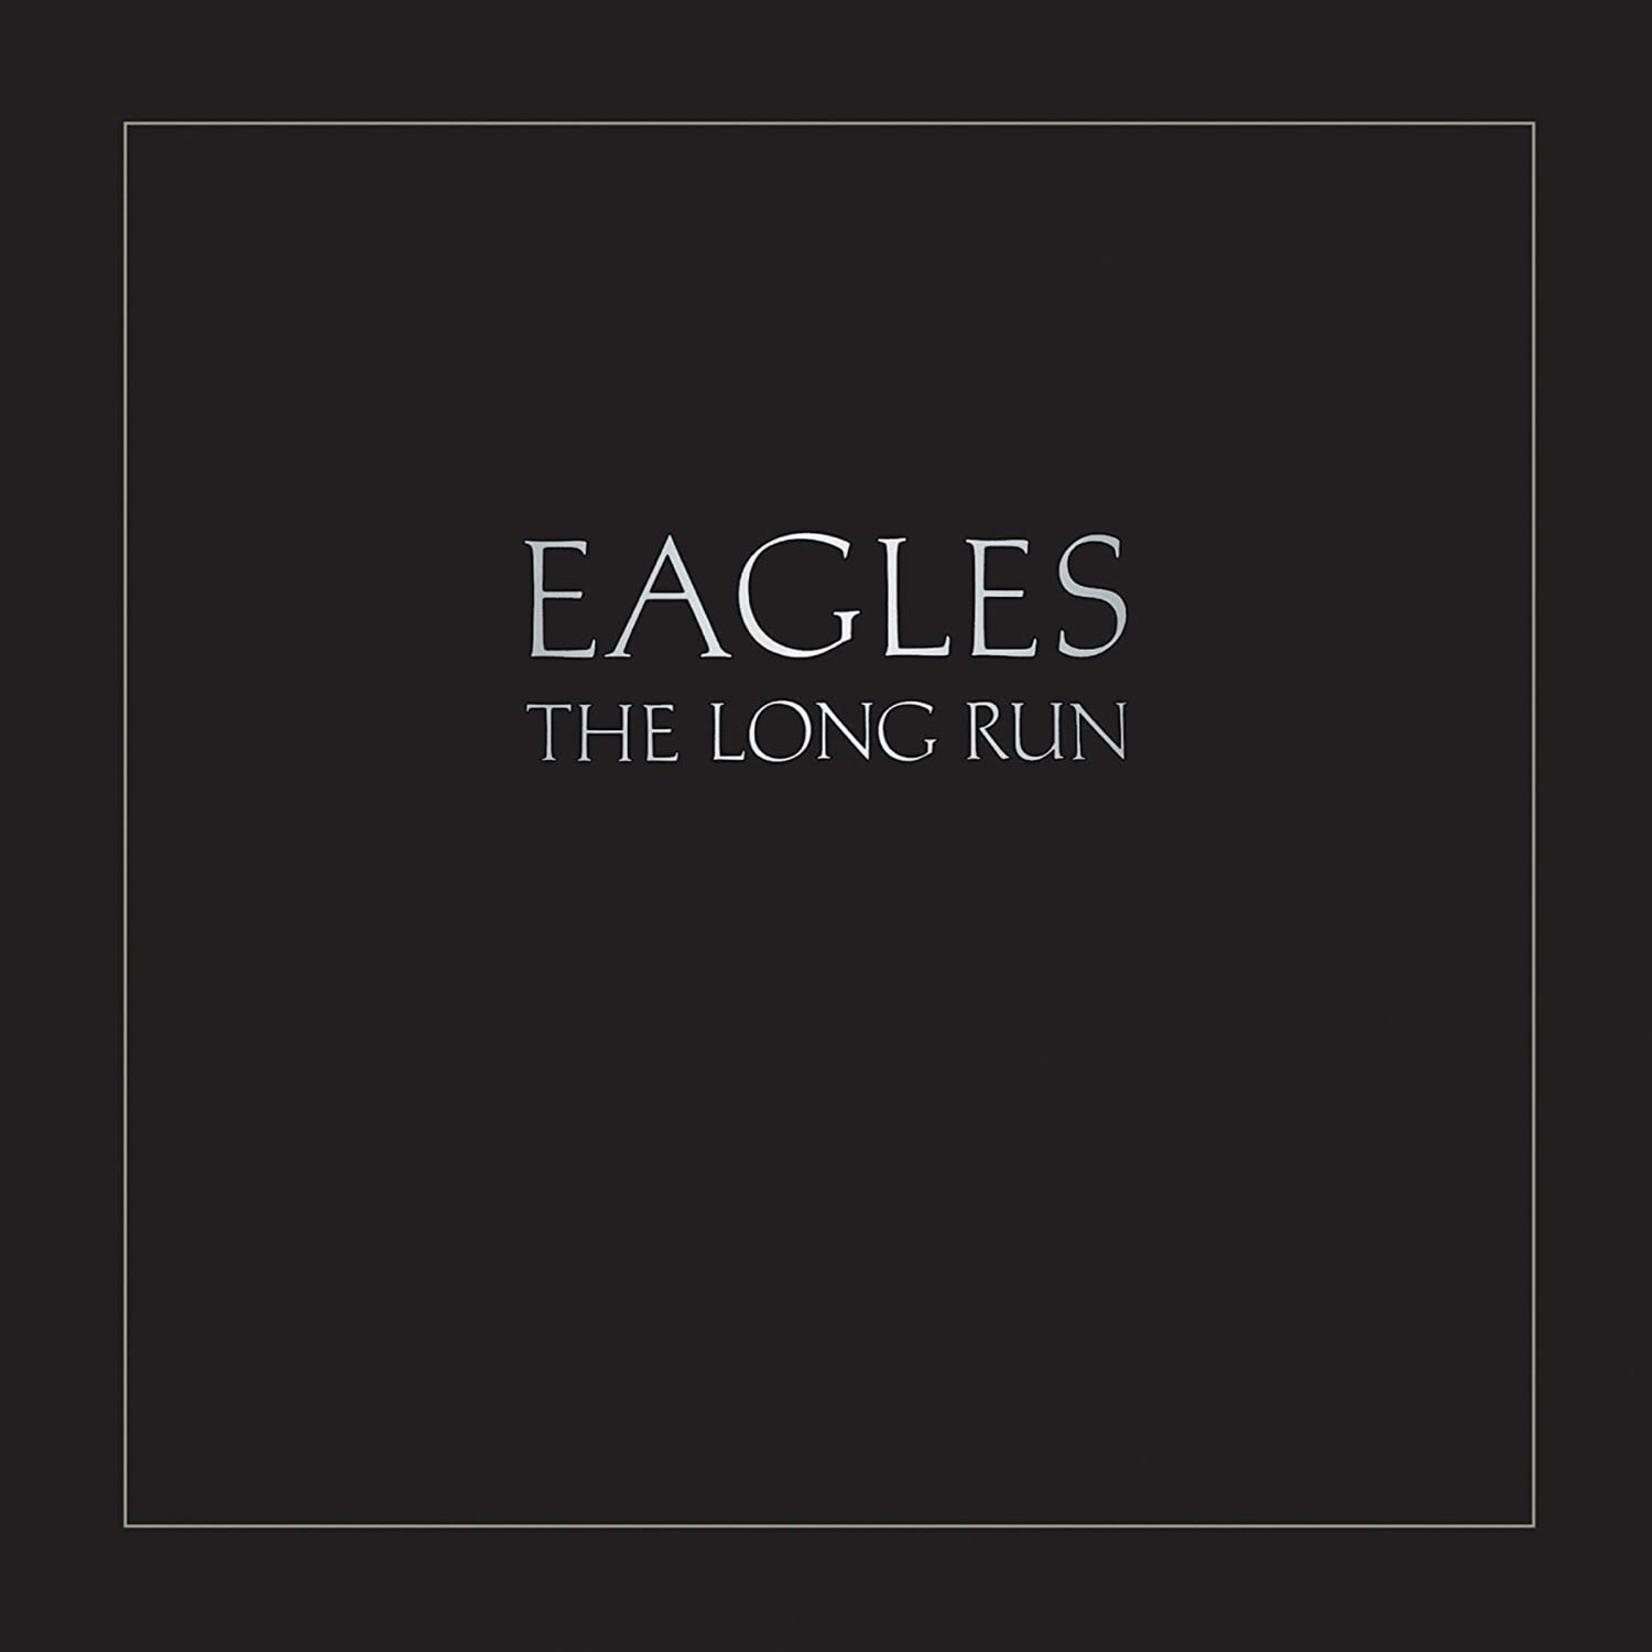 [Vintage] Eagles: The Long Run